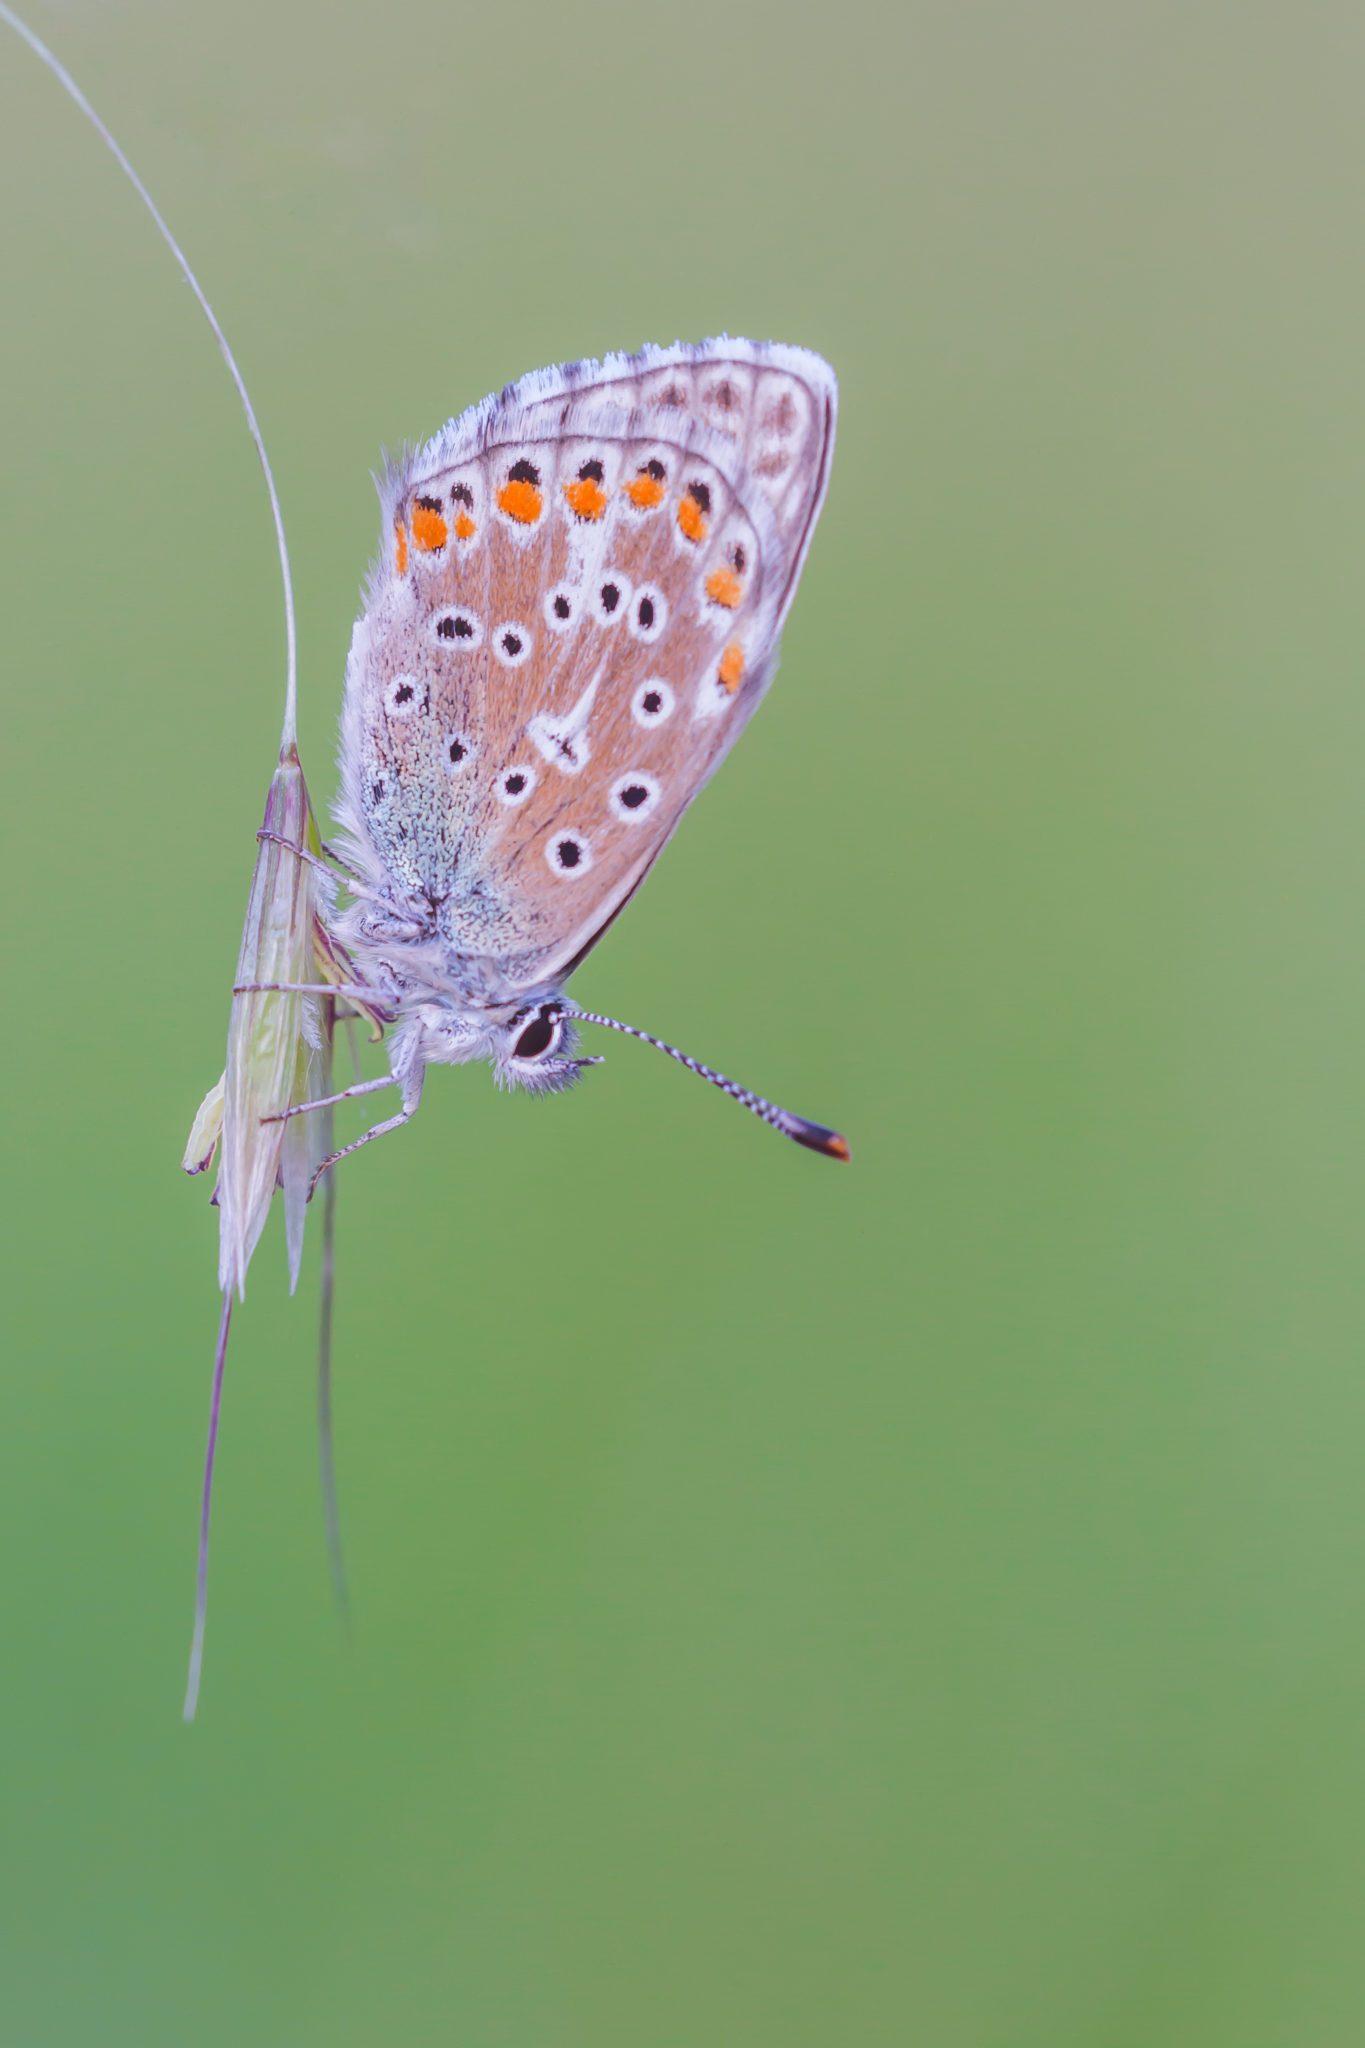 Oranjetipje, Vlinder, Vlinders, Butterflies, Butterfly, Vlinders fotograferen, Vlinderfotografie, Macro, Macrofotografie, Natuurfotografie, Deknatel, Leo Deknatel, Deknatelfotografie